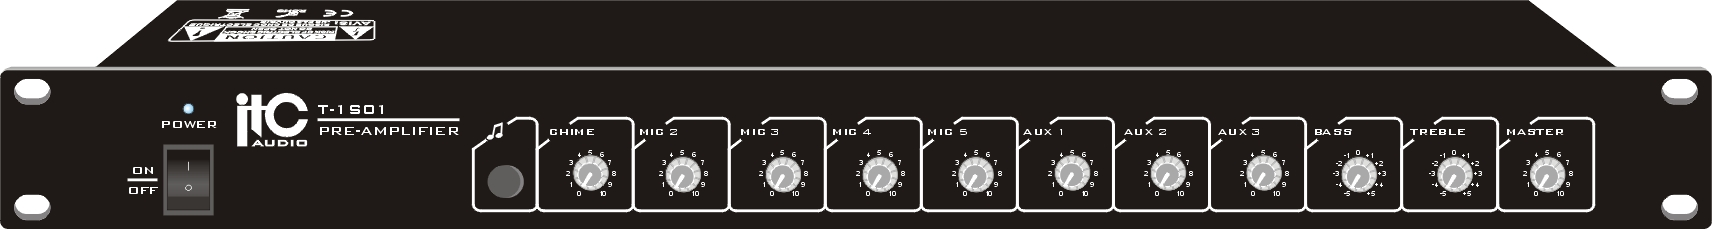 Bộ tiền khuếch đại ( Mixer Pre-amplifier) ITC T-1S01